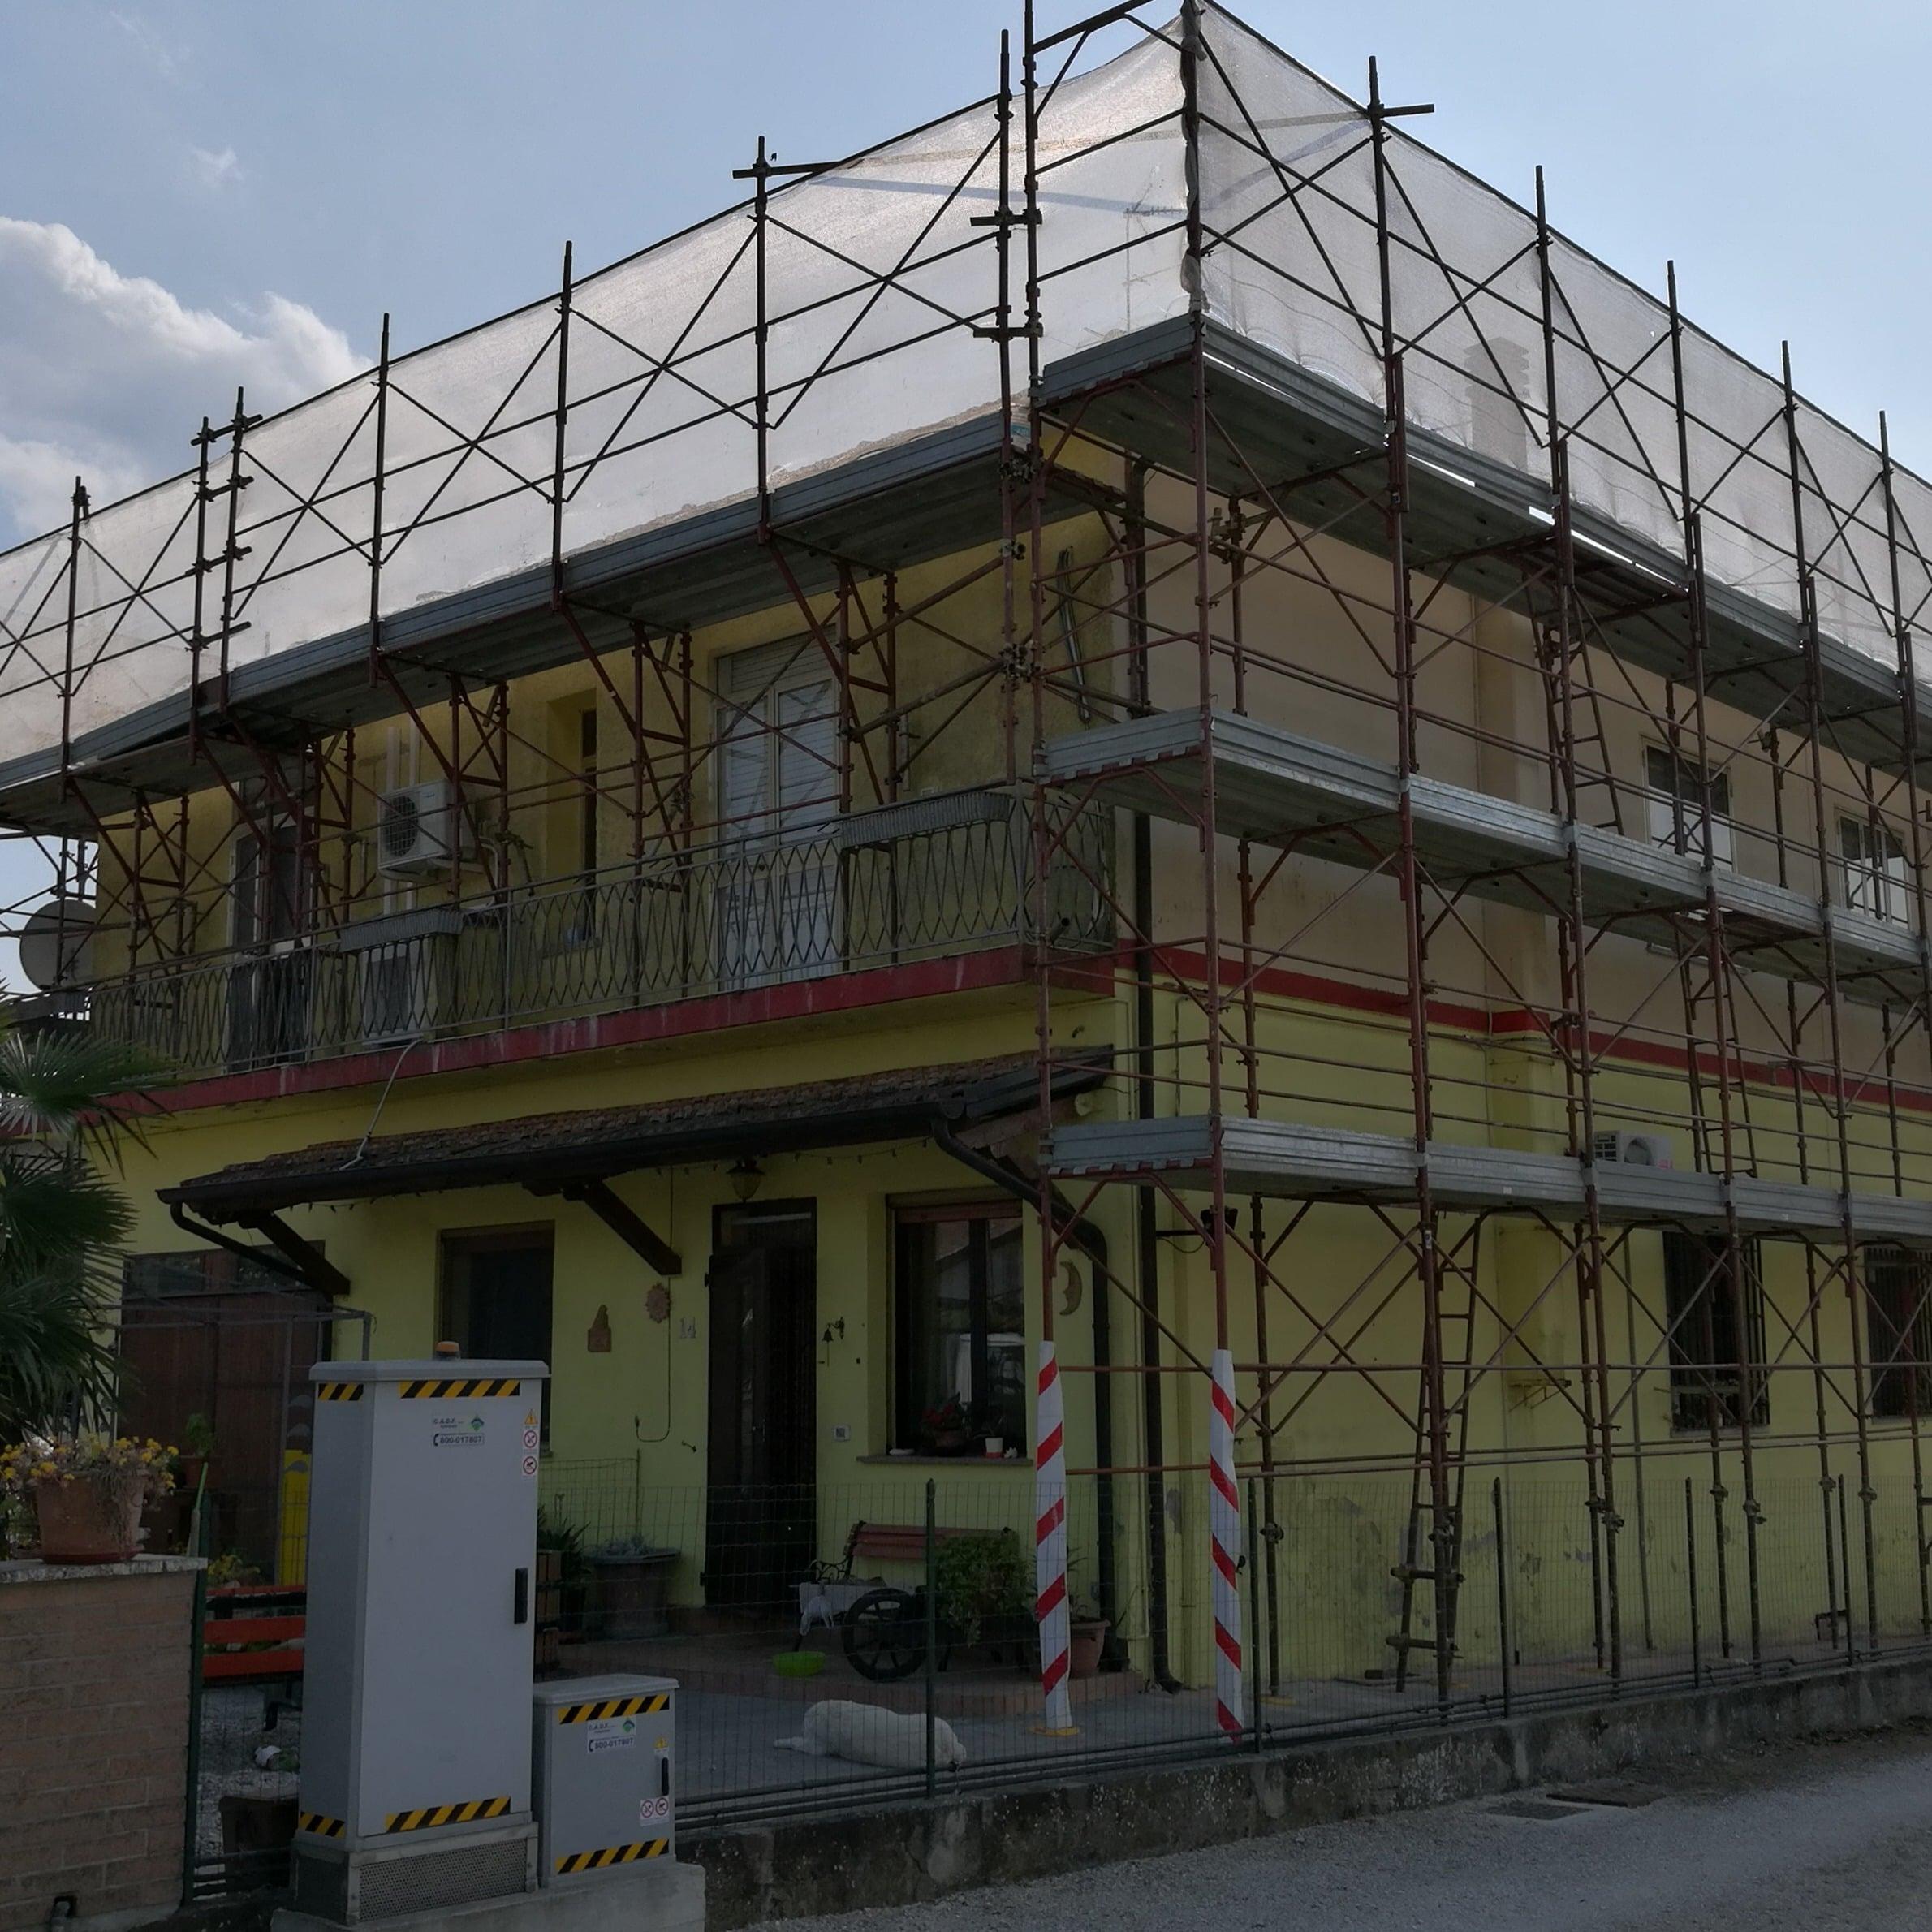 Clienti Per Imprese Edili le migliori 40 imprese edili per ristrutturazioni a ferrara